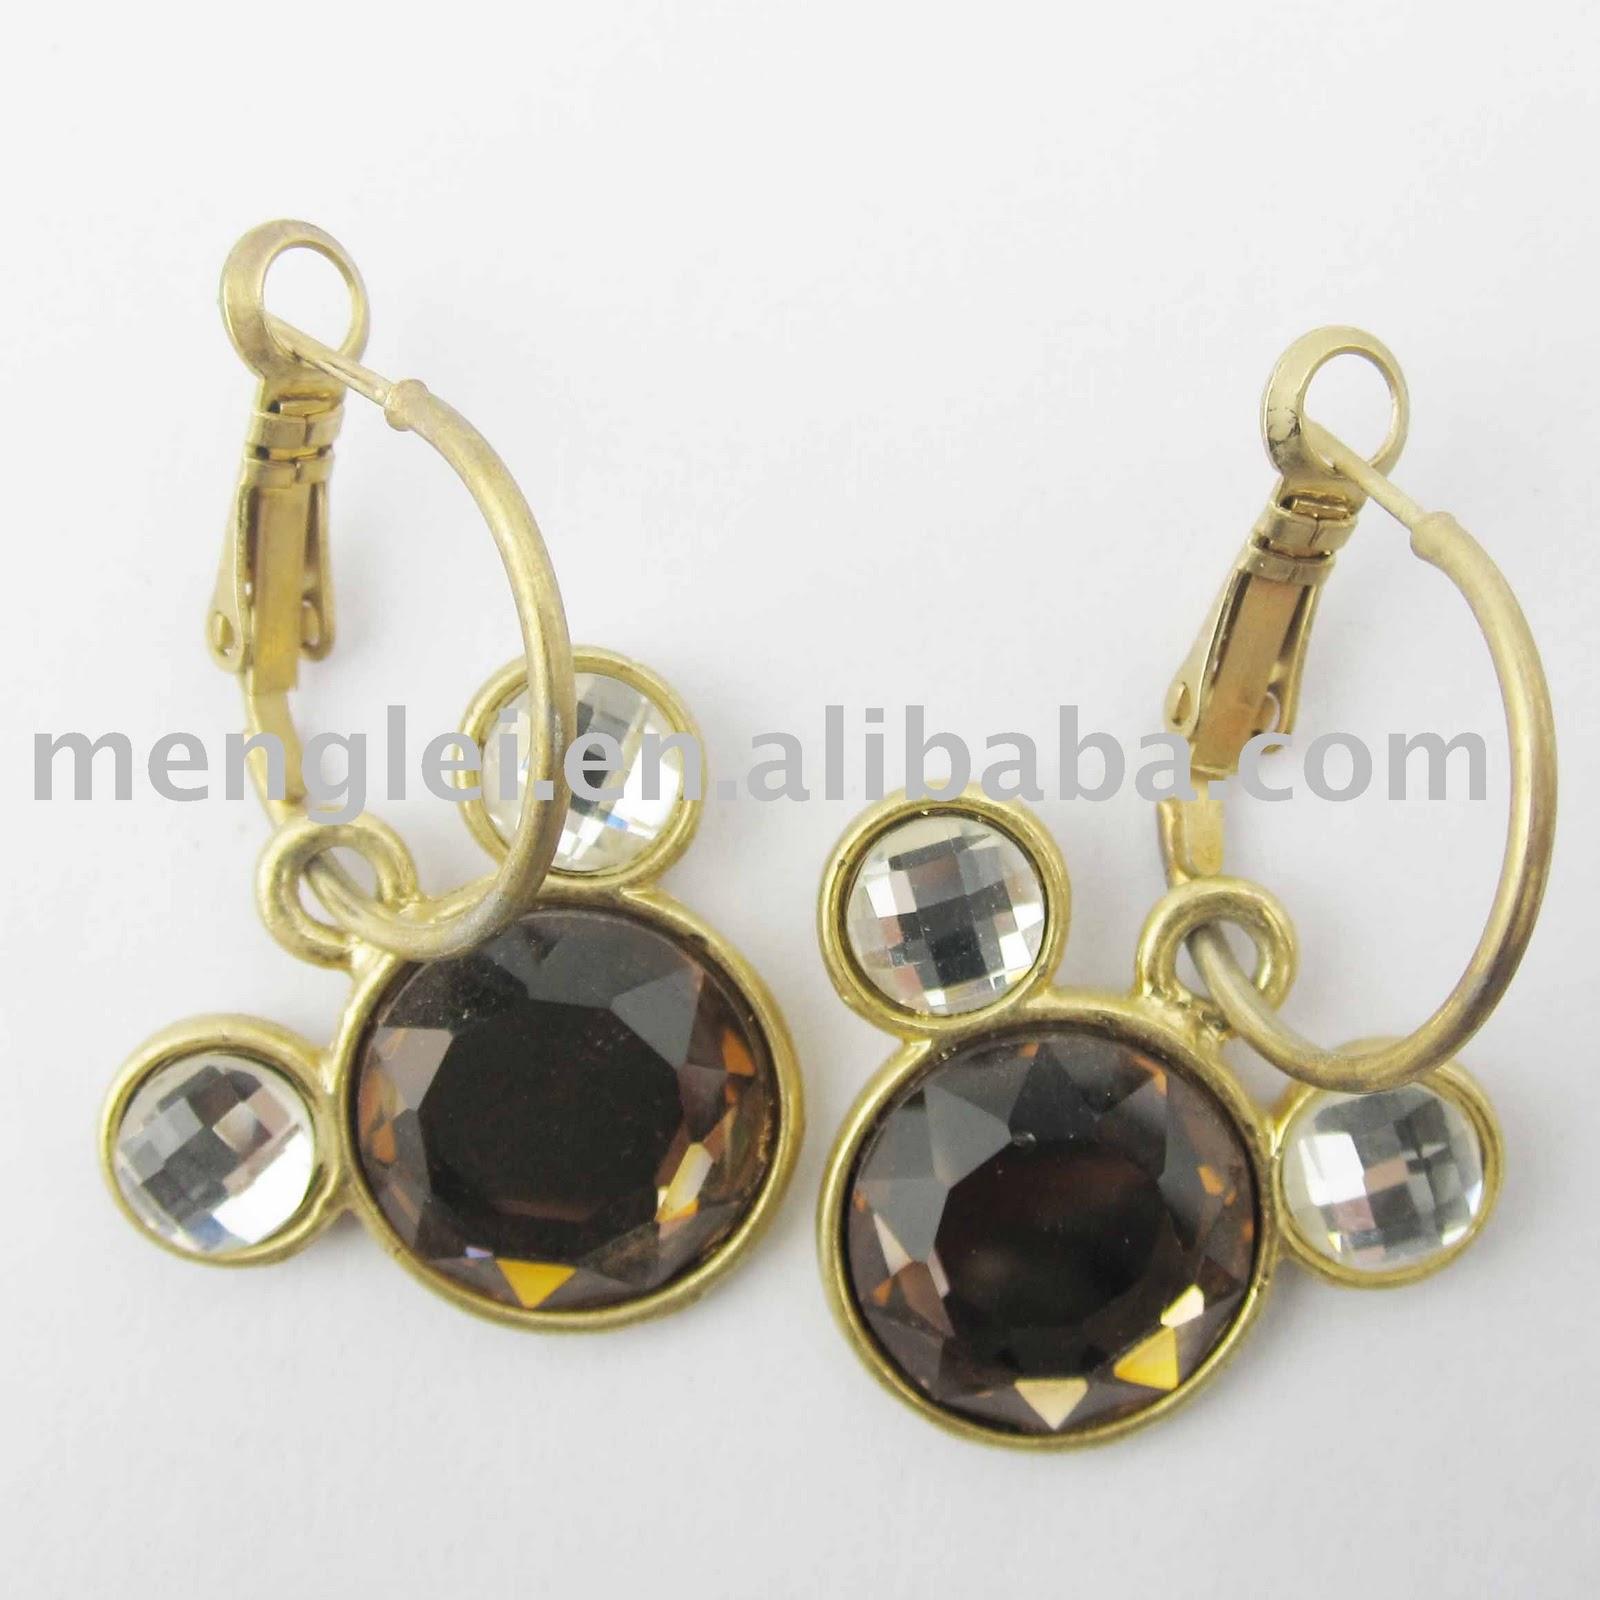 Earrings Fashion - Fashion Styles